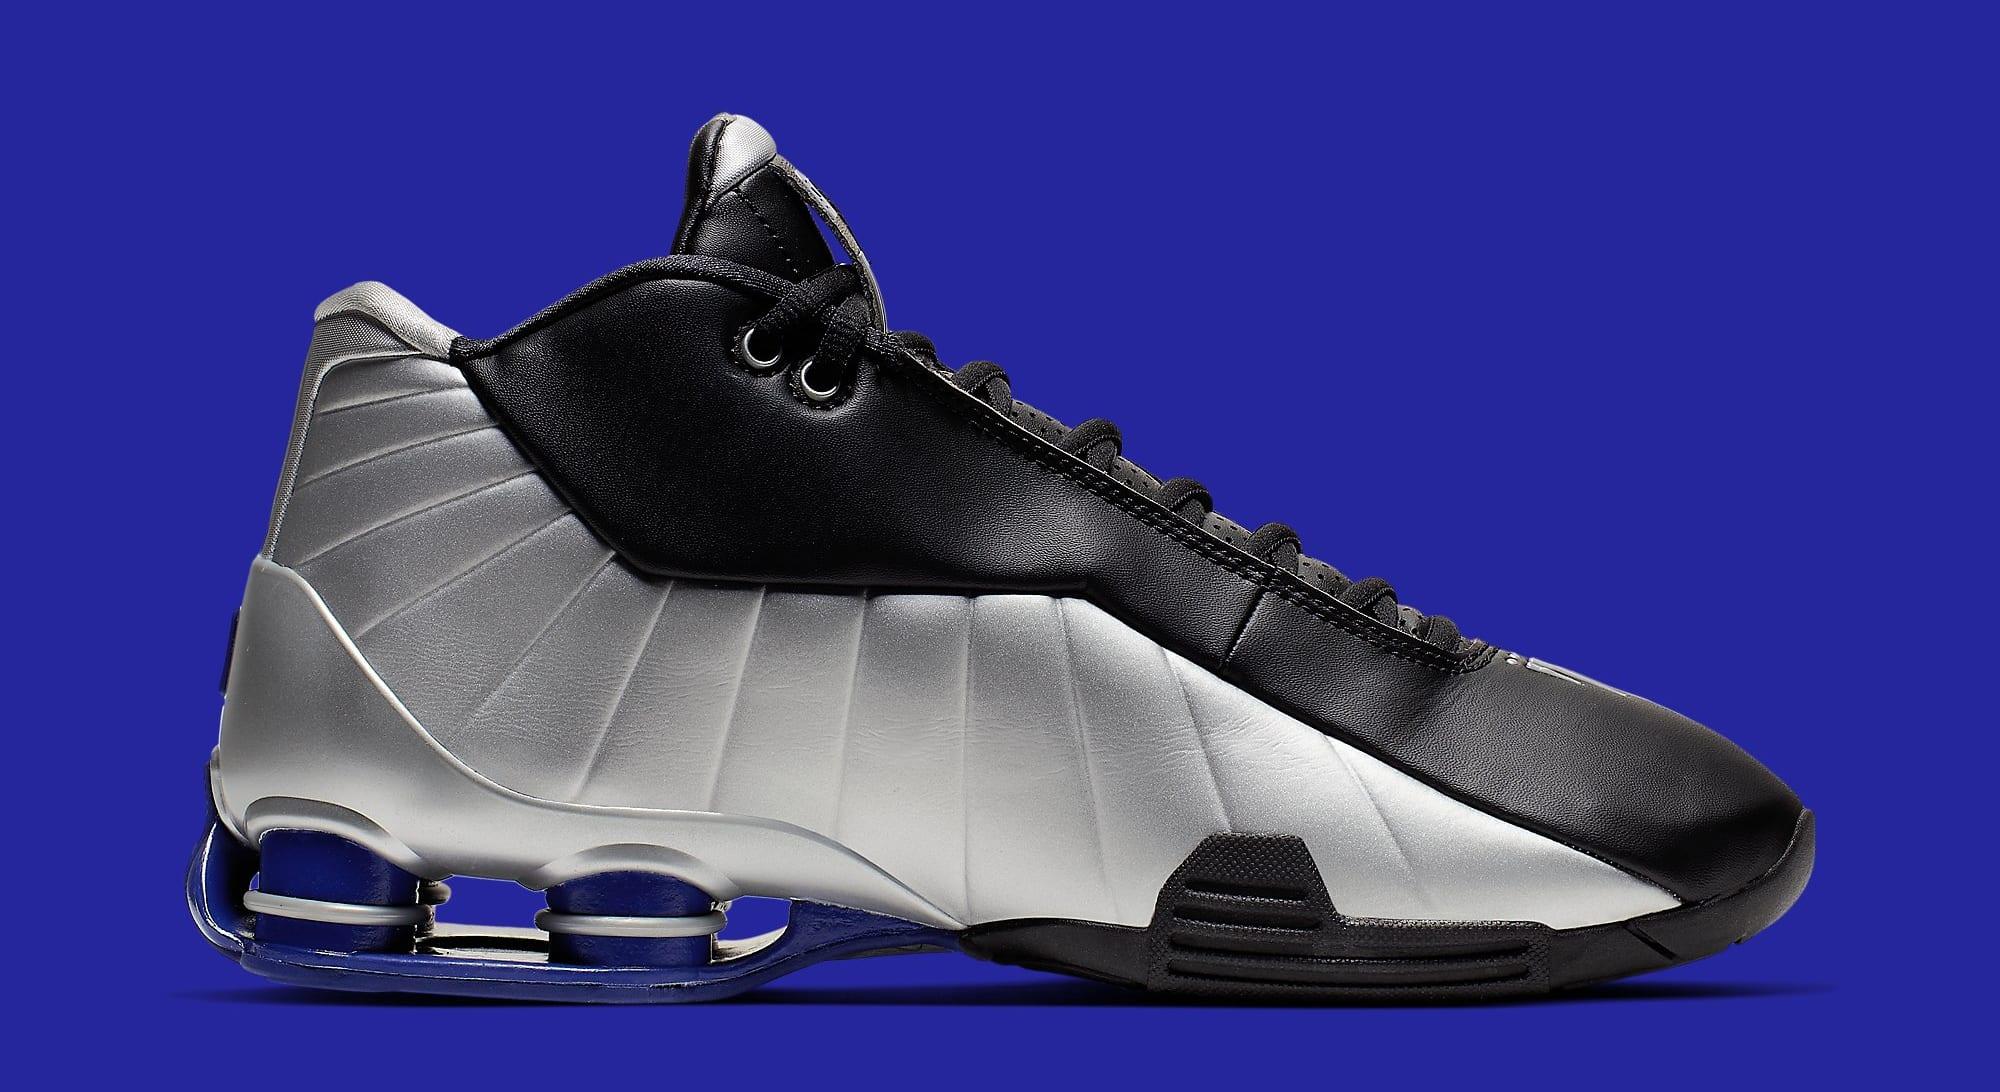 Nike Shox BB4 OG 'Metallic Silver' AT7843-001 Medial